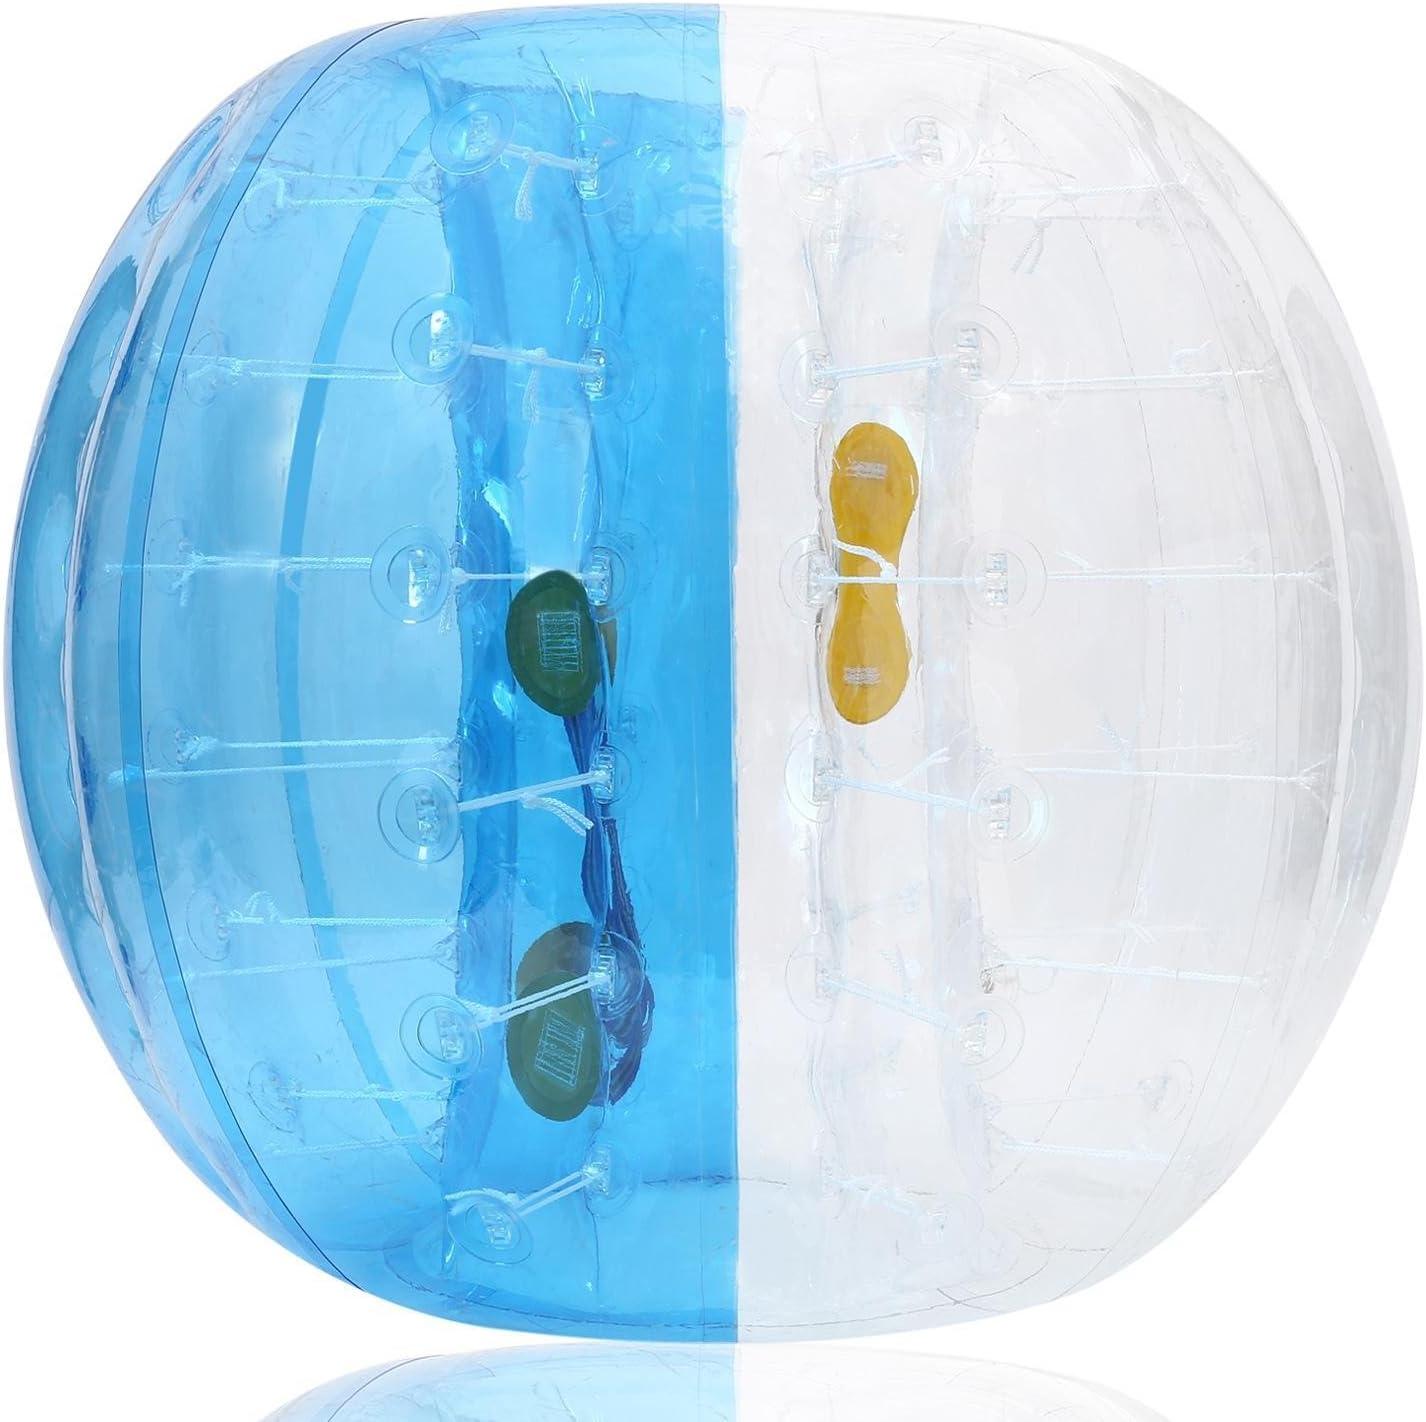 Amazon.com: keland transparente hinchable bolas inflables ...